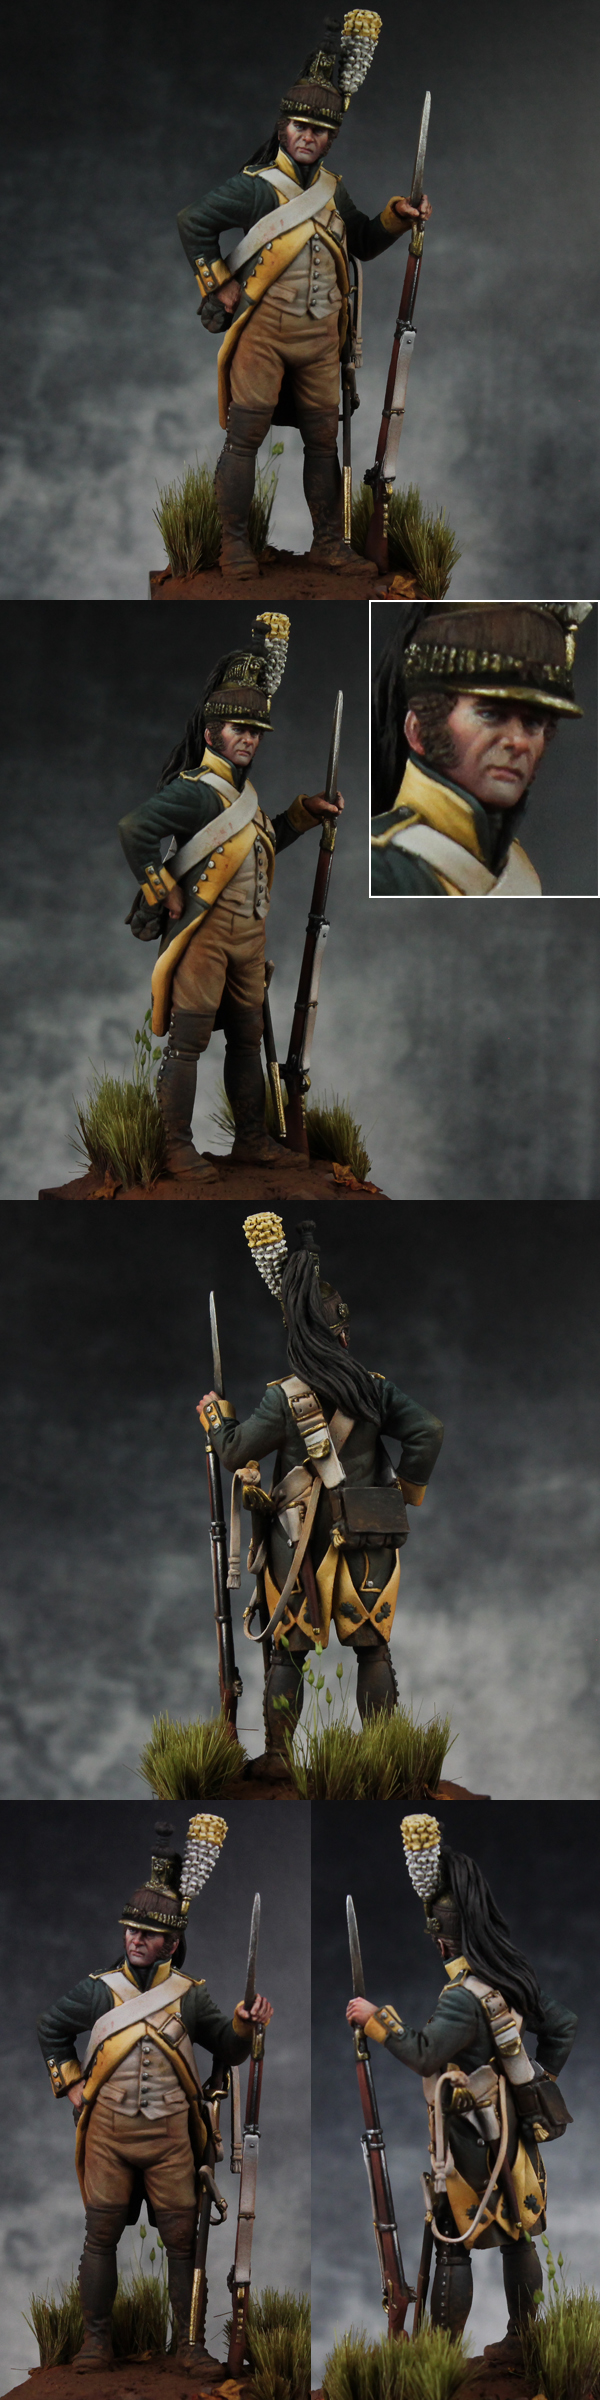 French Dragoon